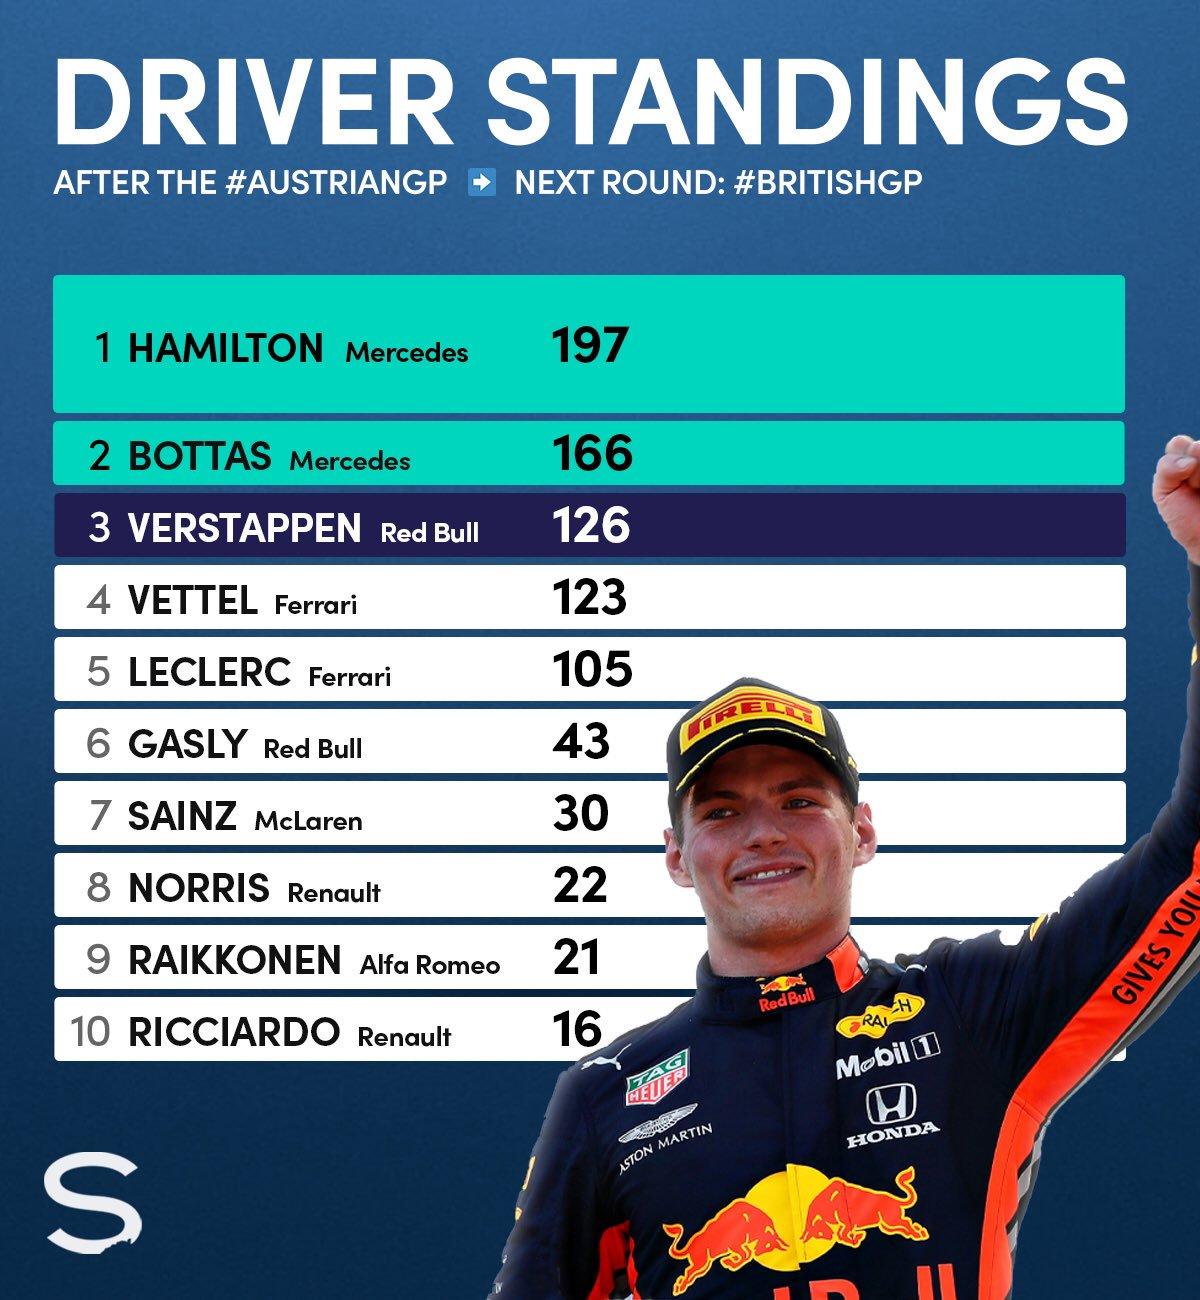 2019 Austrian GP WDC table copy.jpg